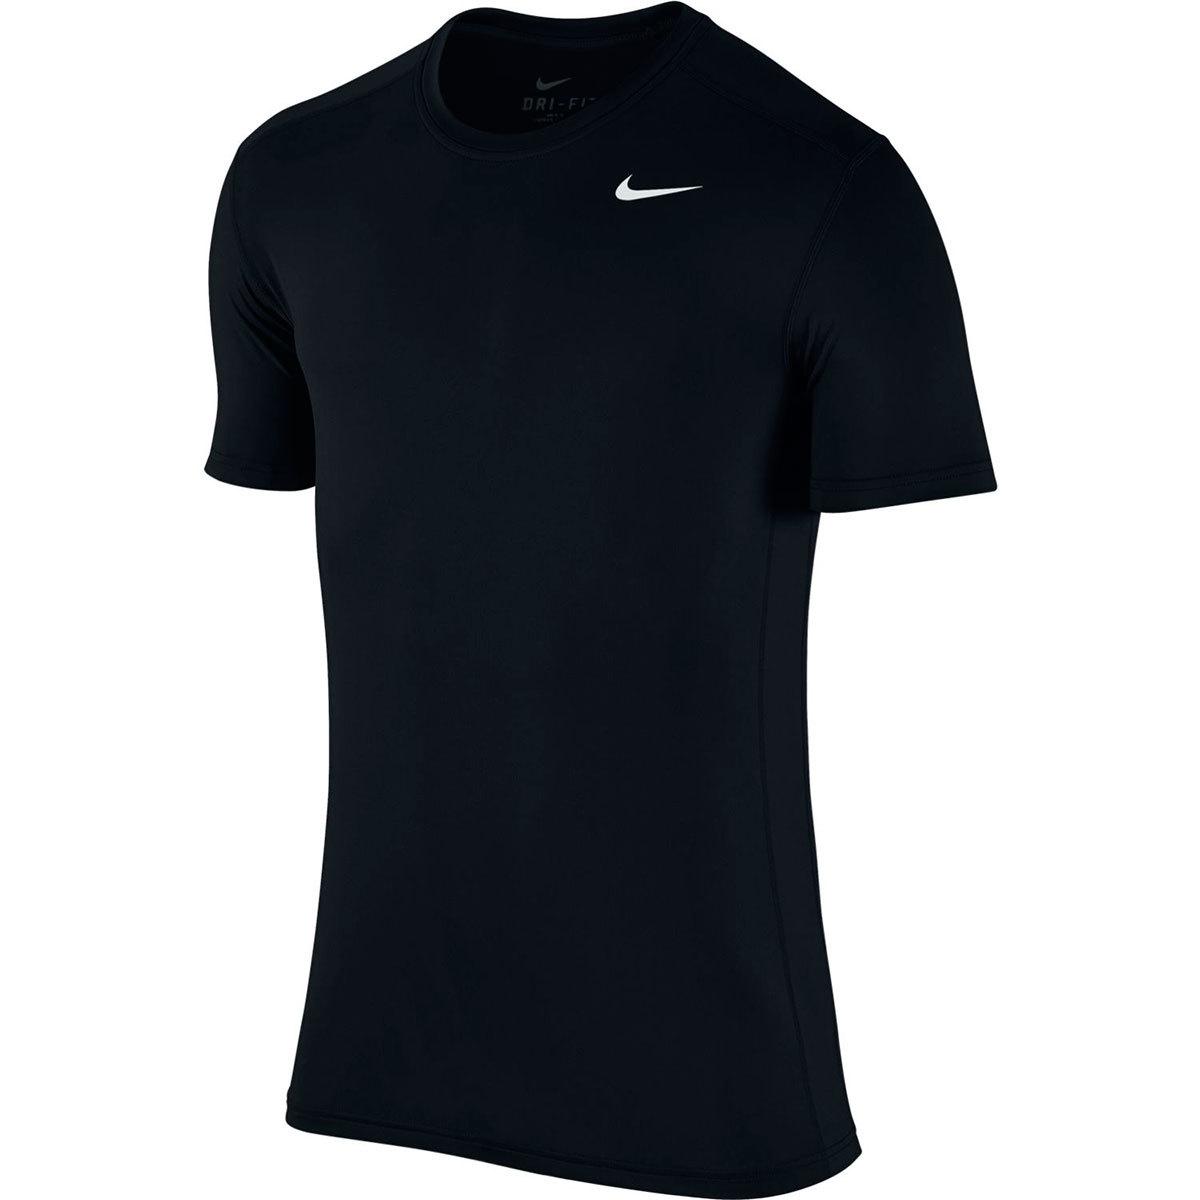 Nike Men's Dri-Fit Crew Short-Sleeve Base Layer Top - Black, XL